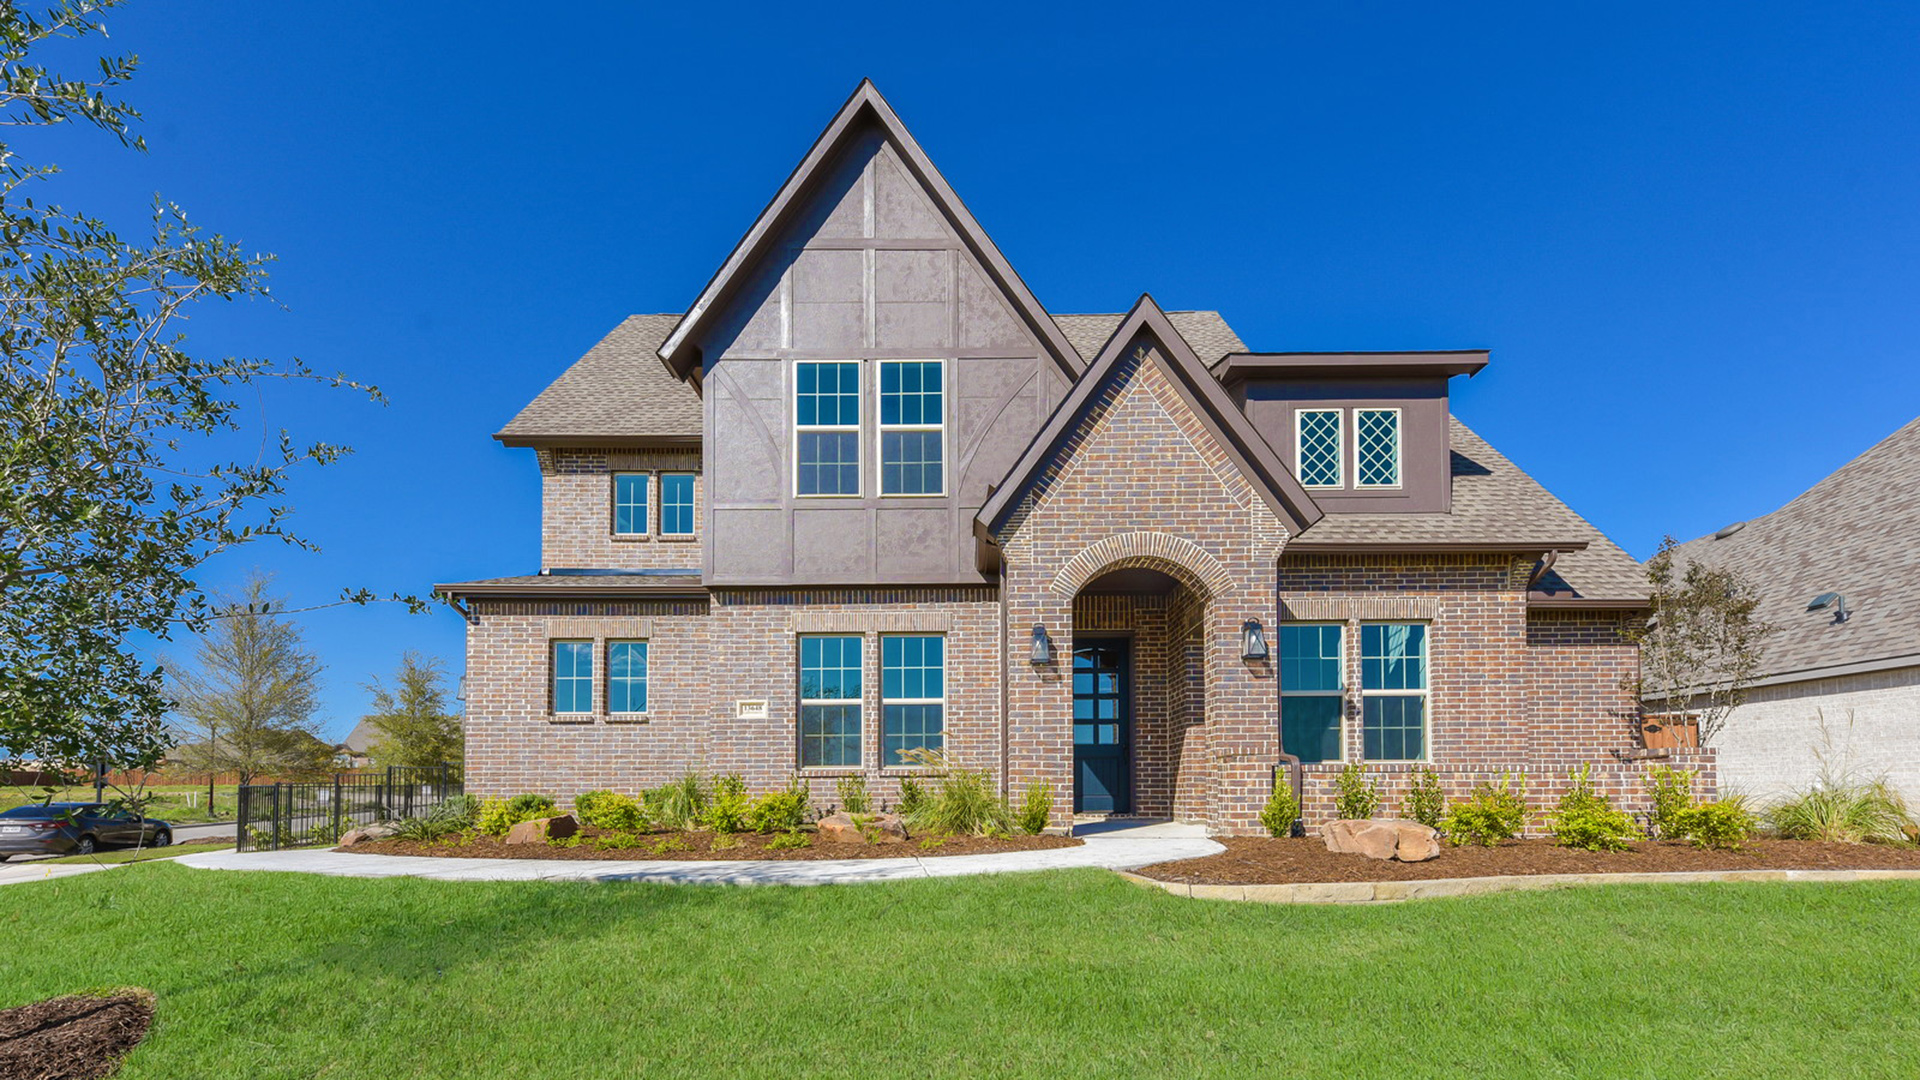 Appealing brick exterior